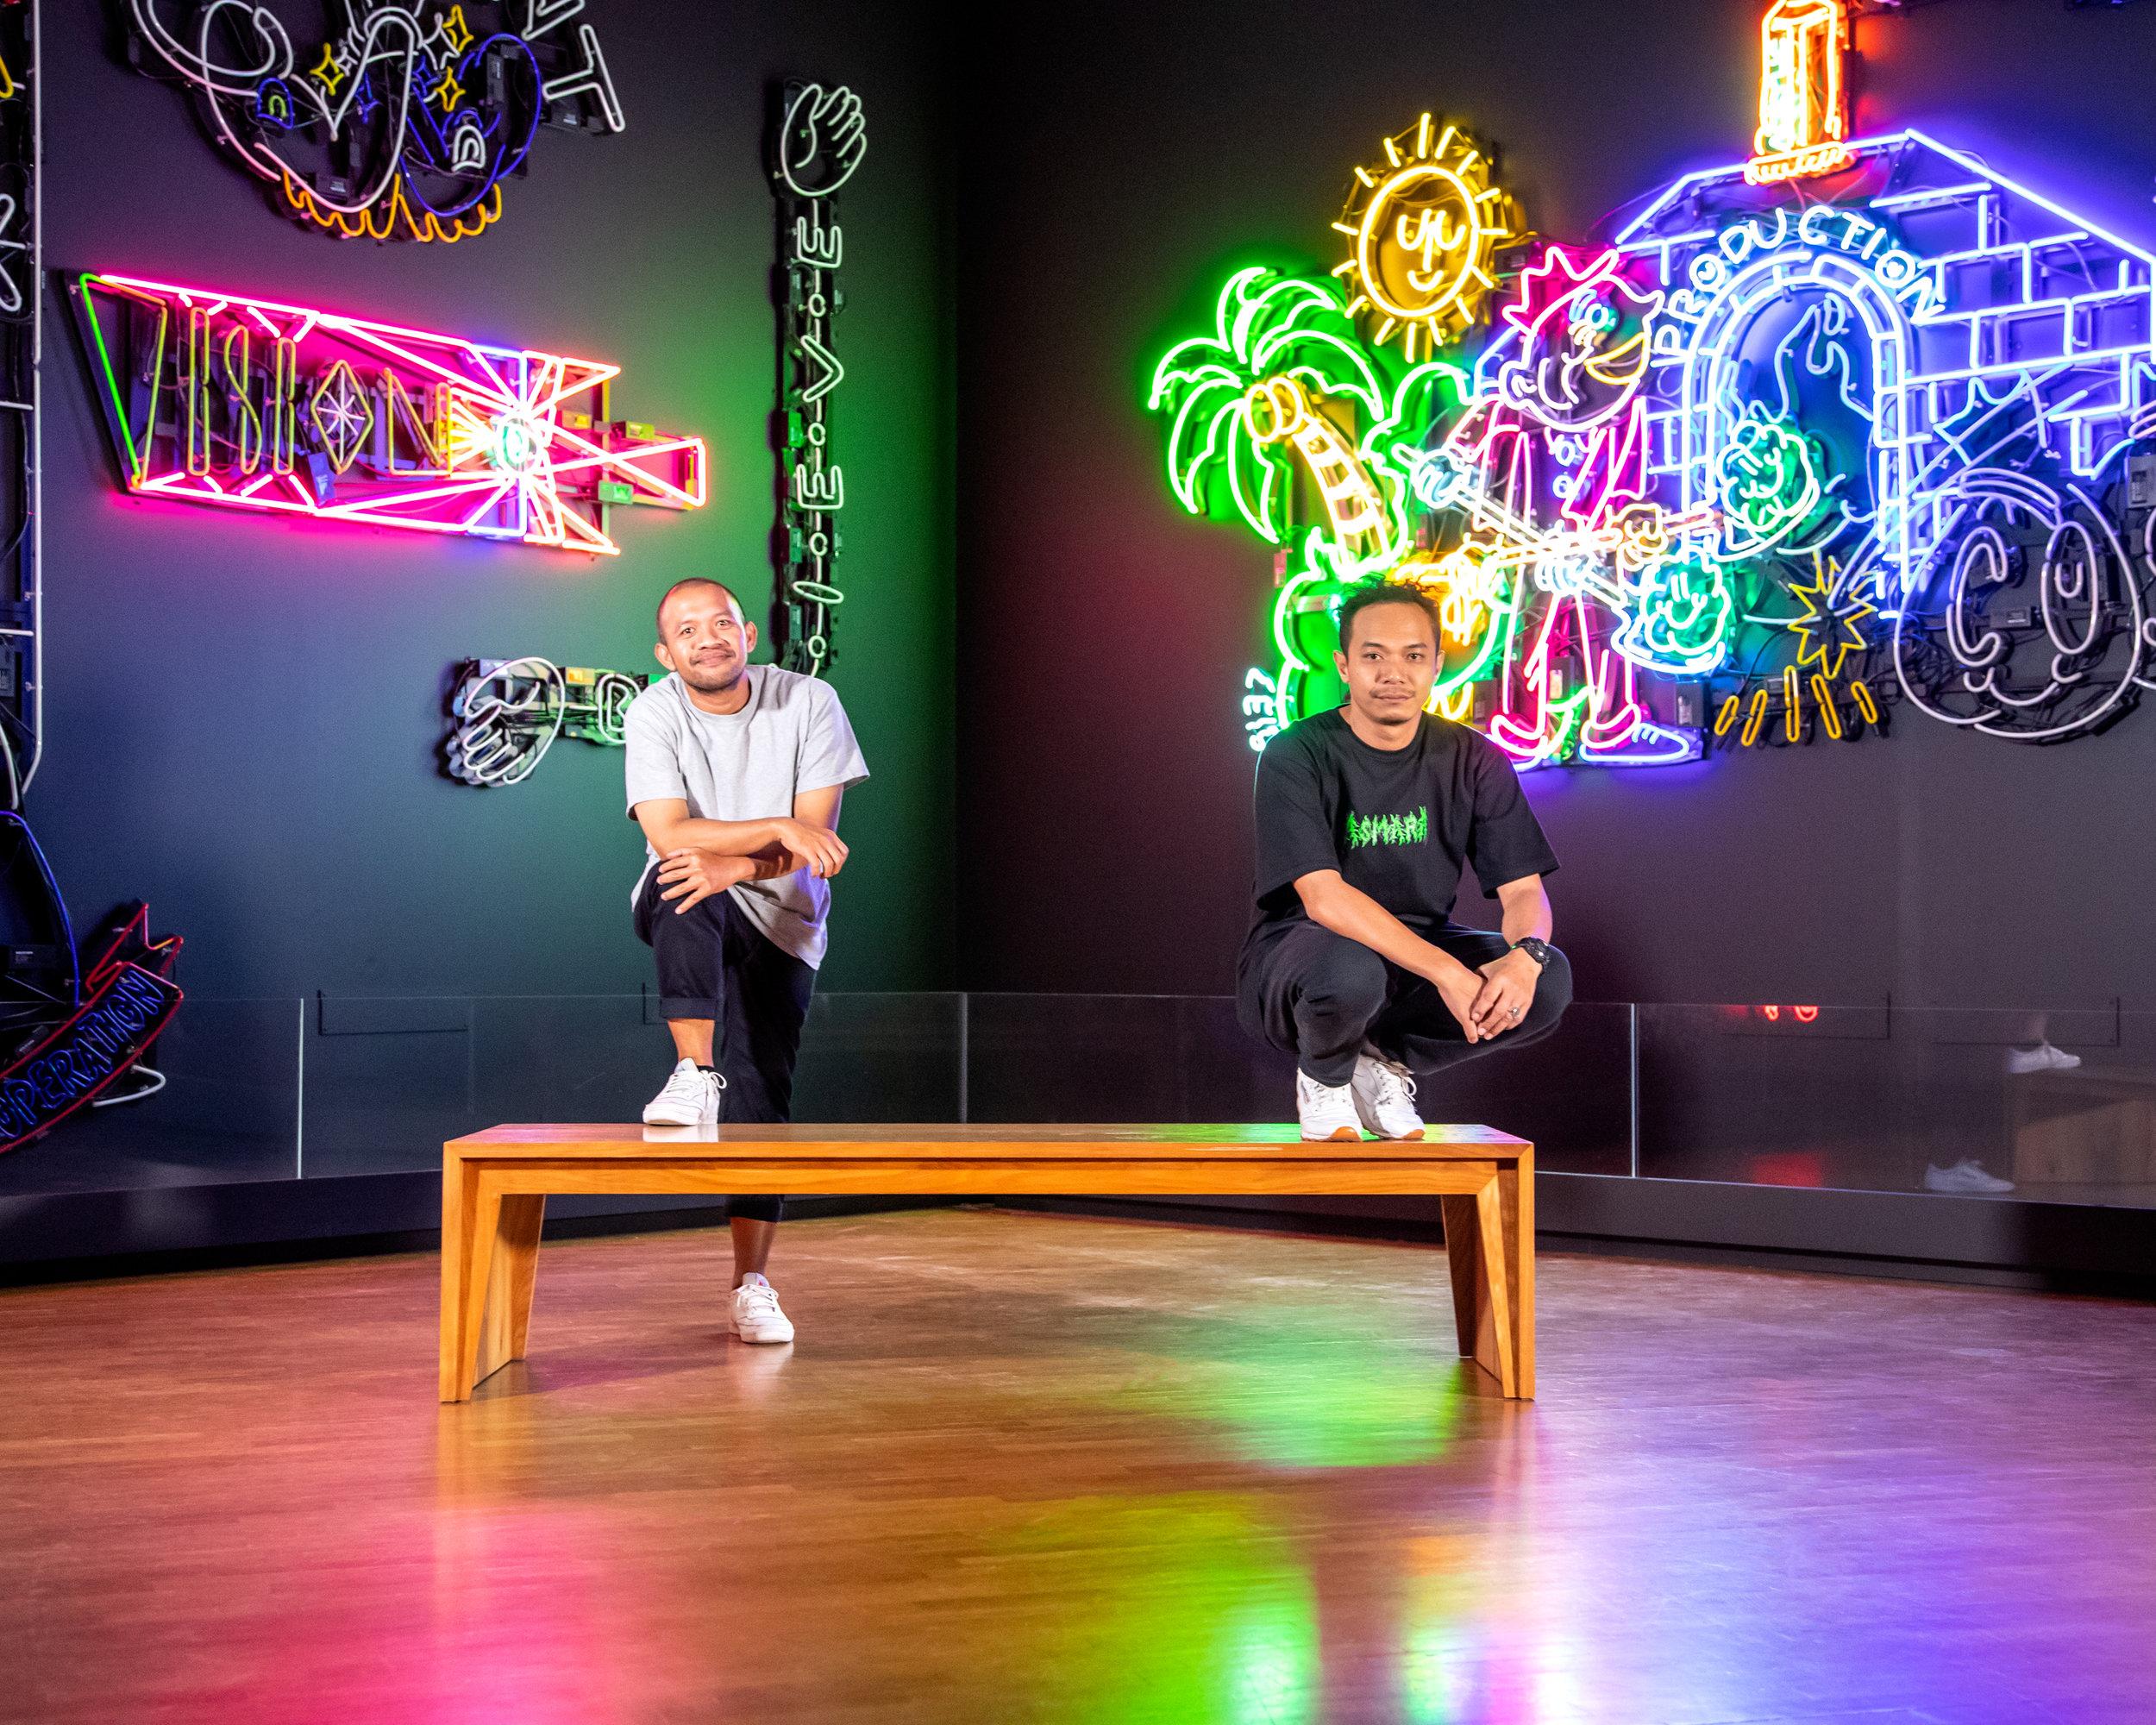 Artist  Uji 'Hahan' Handoko Eko Saputro  and  Adi 'Uma Gumma' Kusama  with their work  Silent Operation: Sign study based on the formula of contemporary (visual) art  (2018-19)